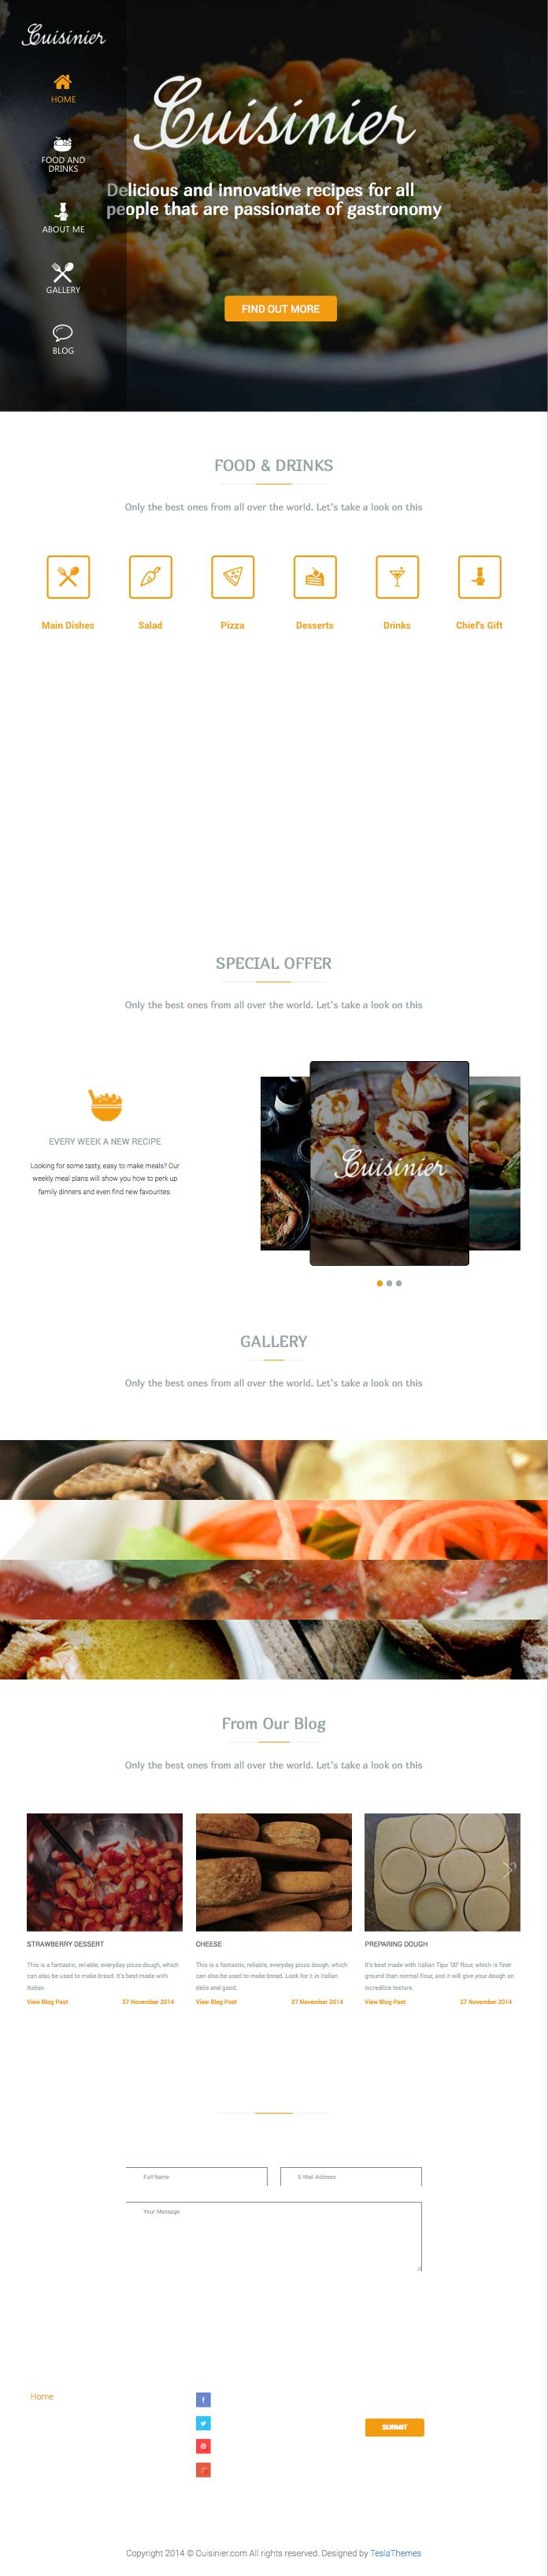 Cuisinier WordPress Food Recipe Theme